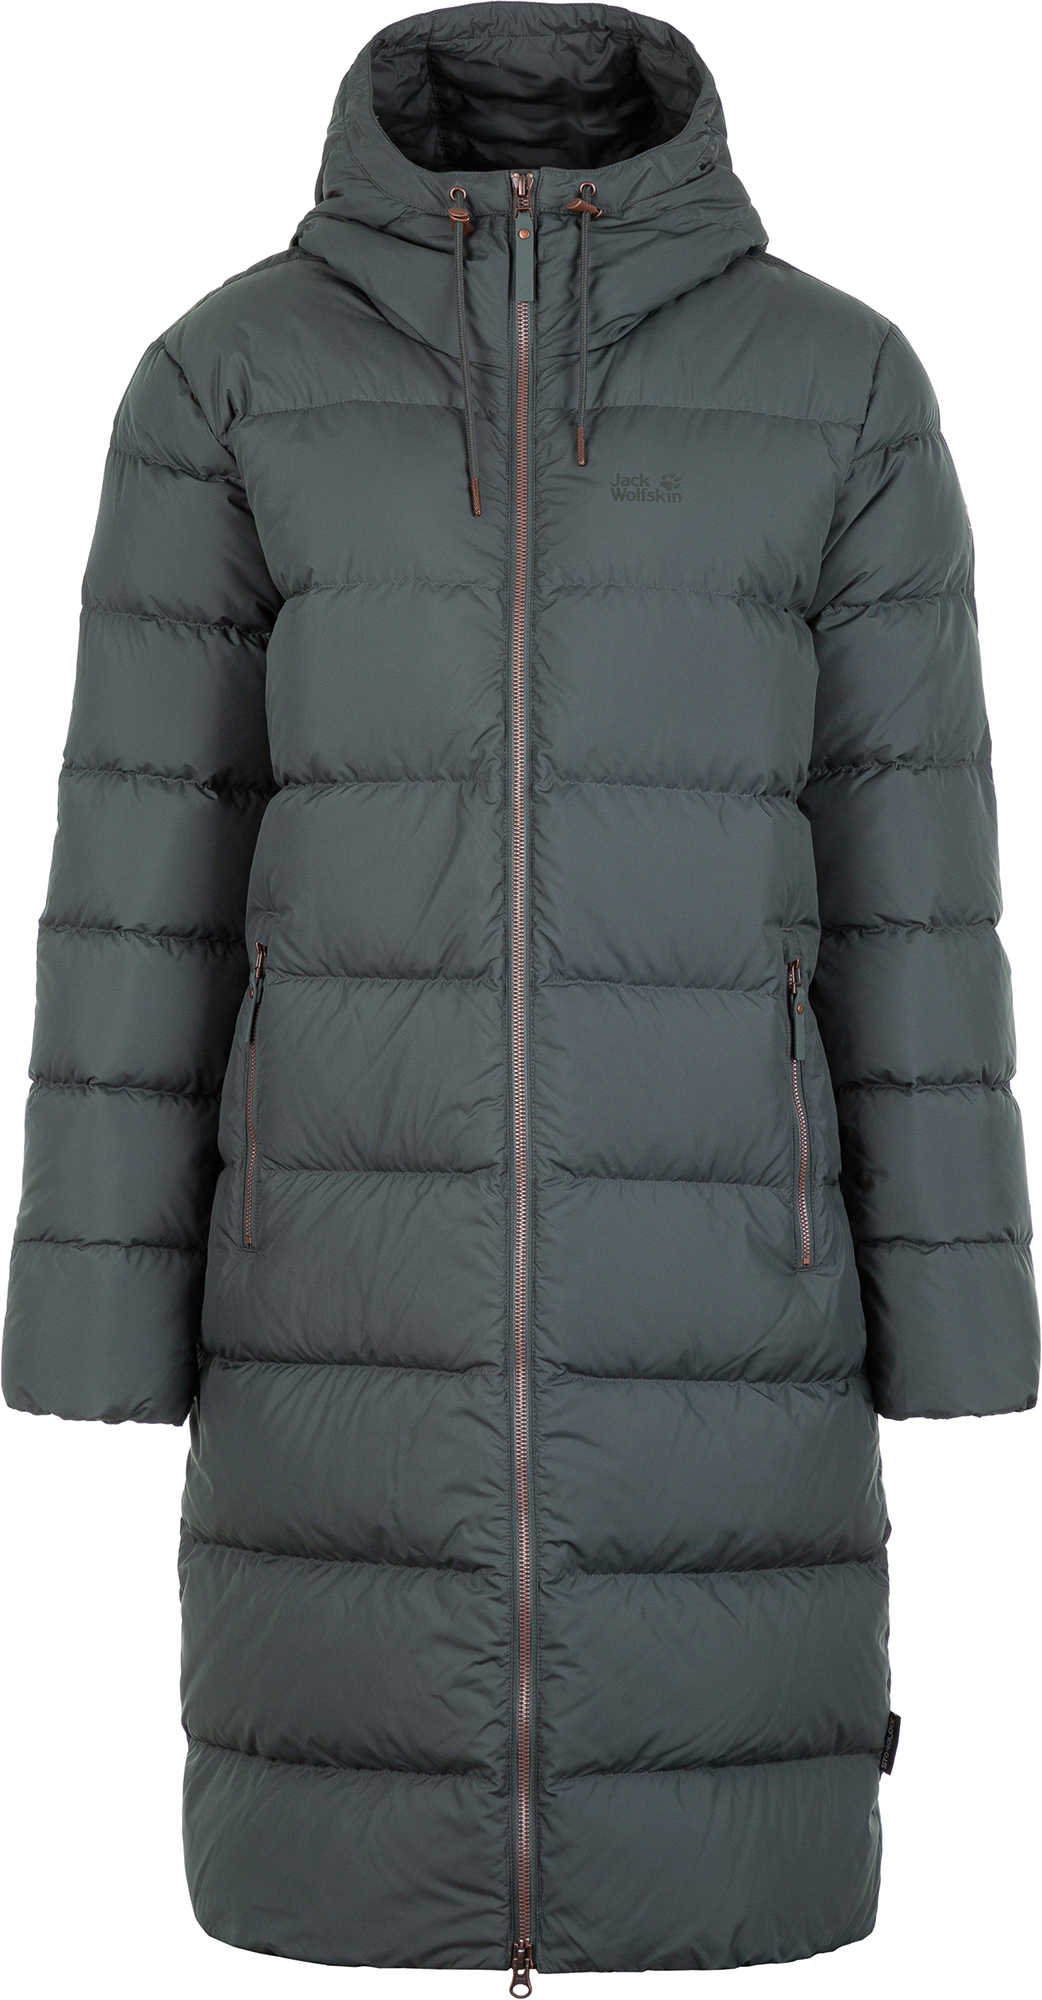 Jack Wolfskin Куртка пуховая женская Jack Wolfskin Crystal Palace, размер 42